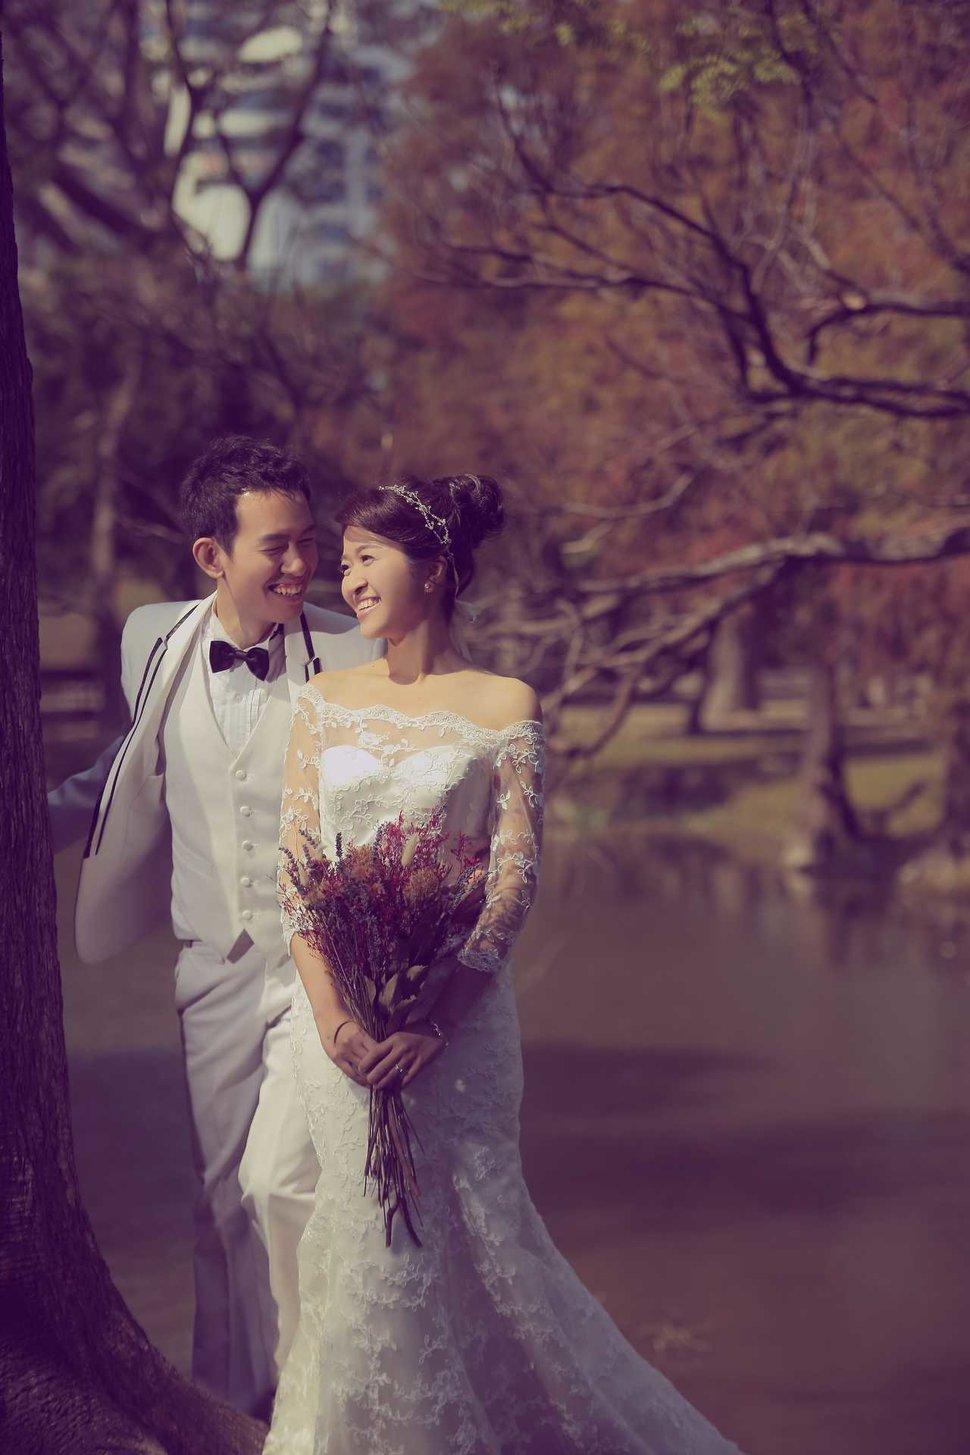 Wedding_Photo_2016_007 - 台南新秘Penny-新娘秘書《結婚吧》